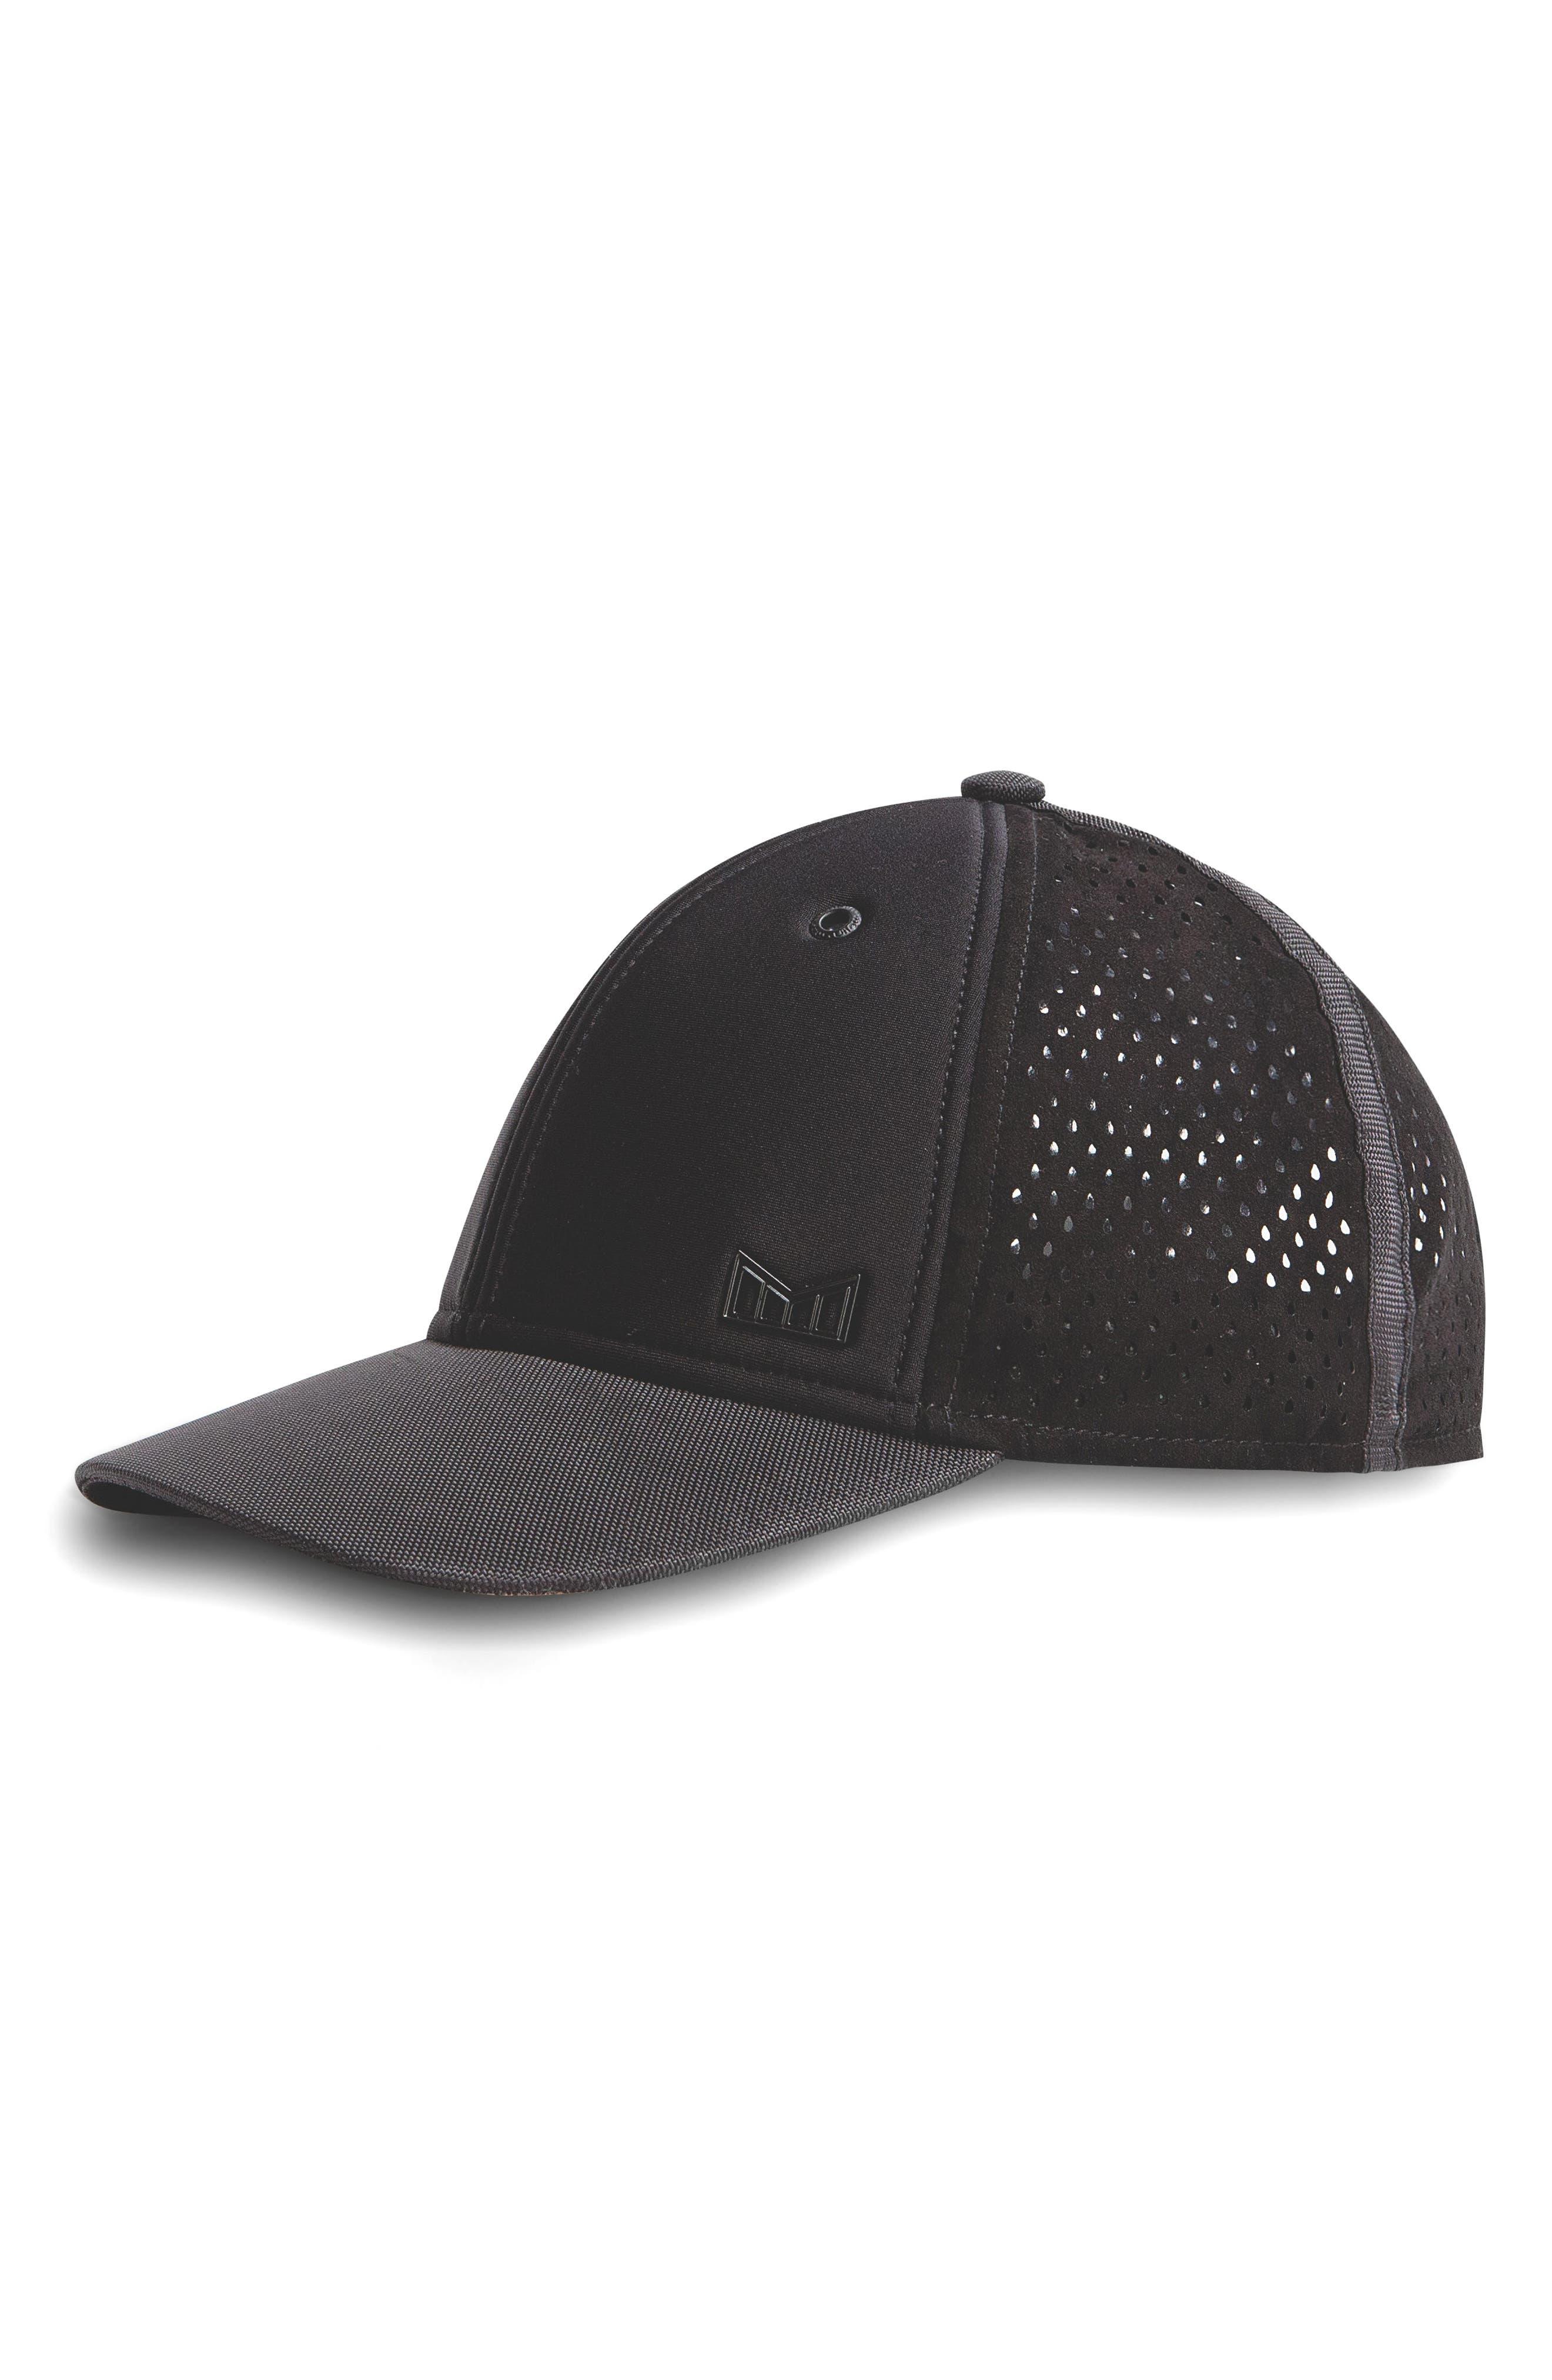 MELIN The Trooper Snapback Baseball Cap